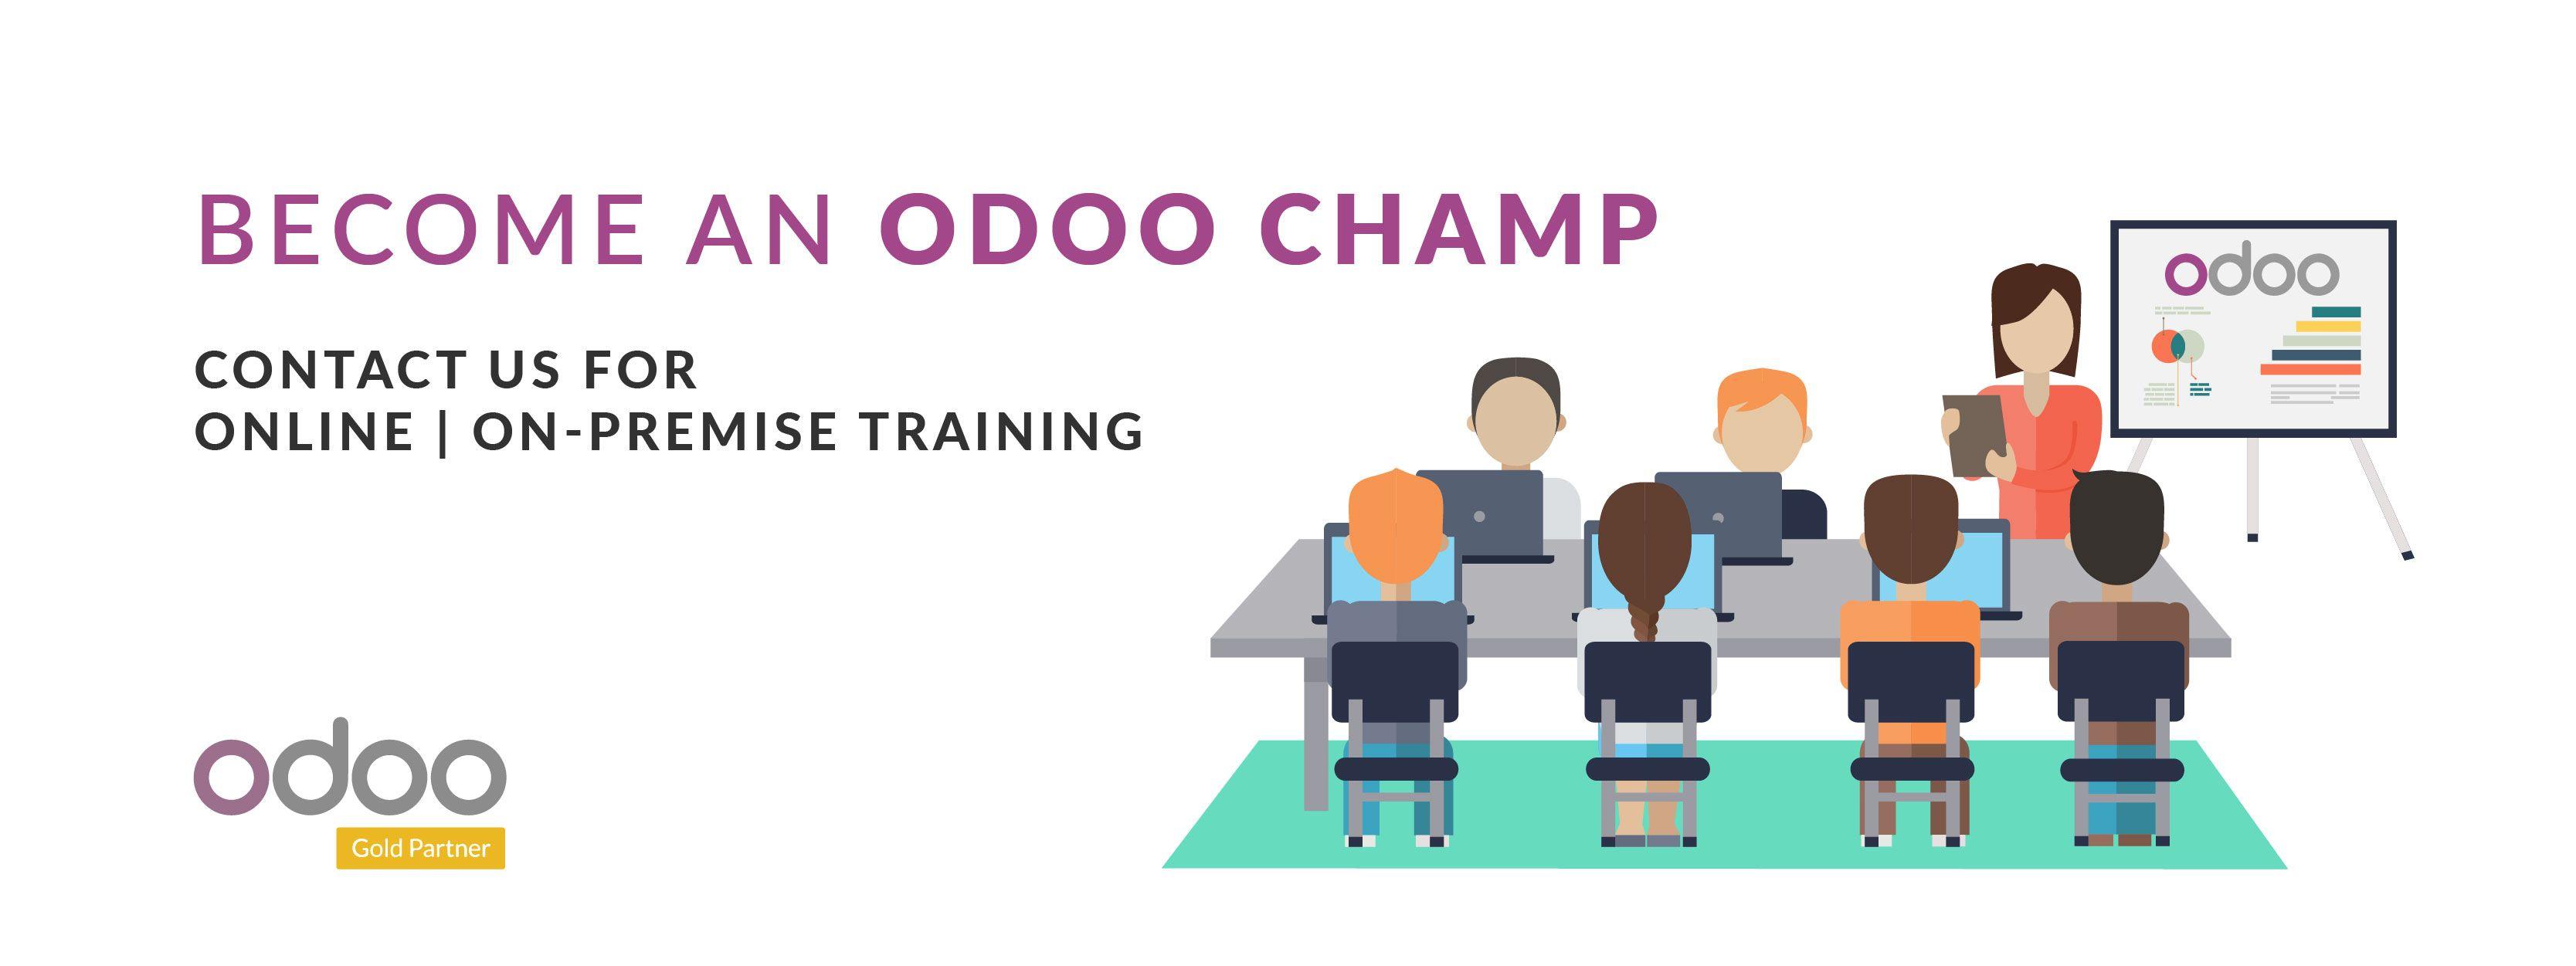 Odoo learn | Technical & Functional Training | Get Odoo